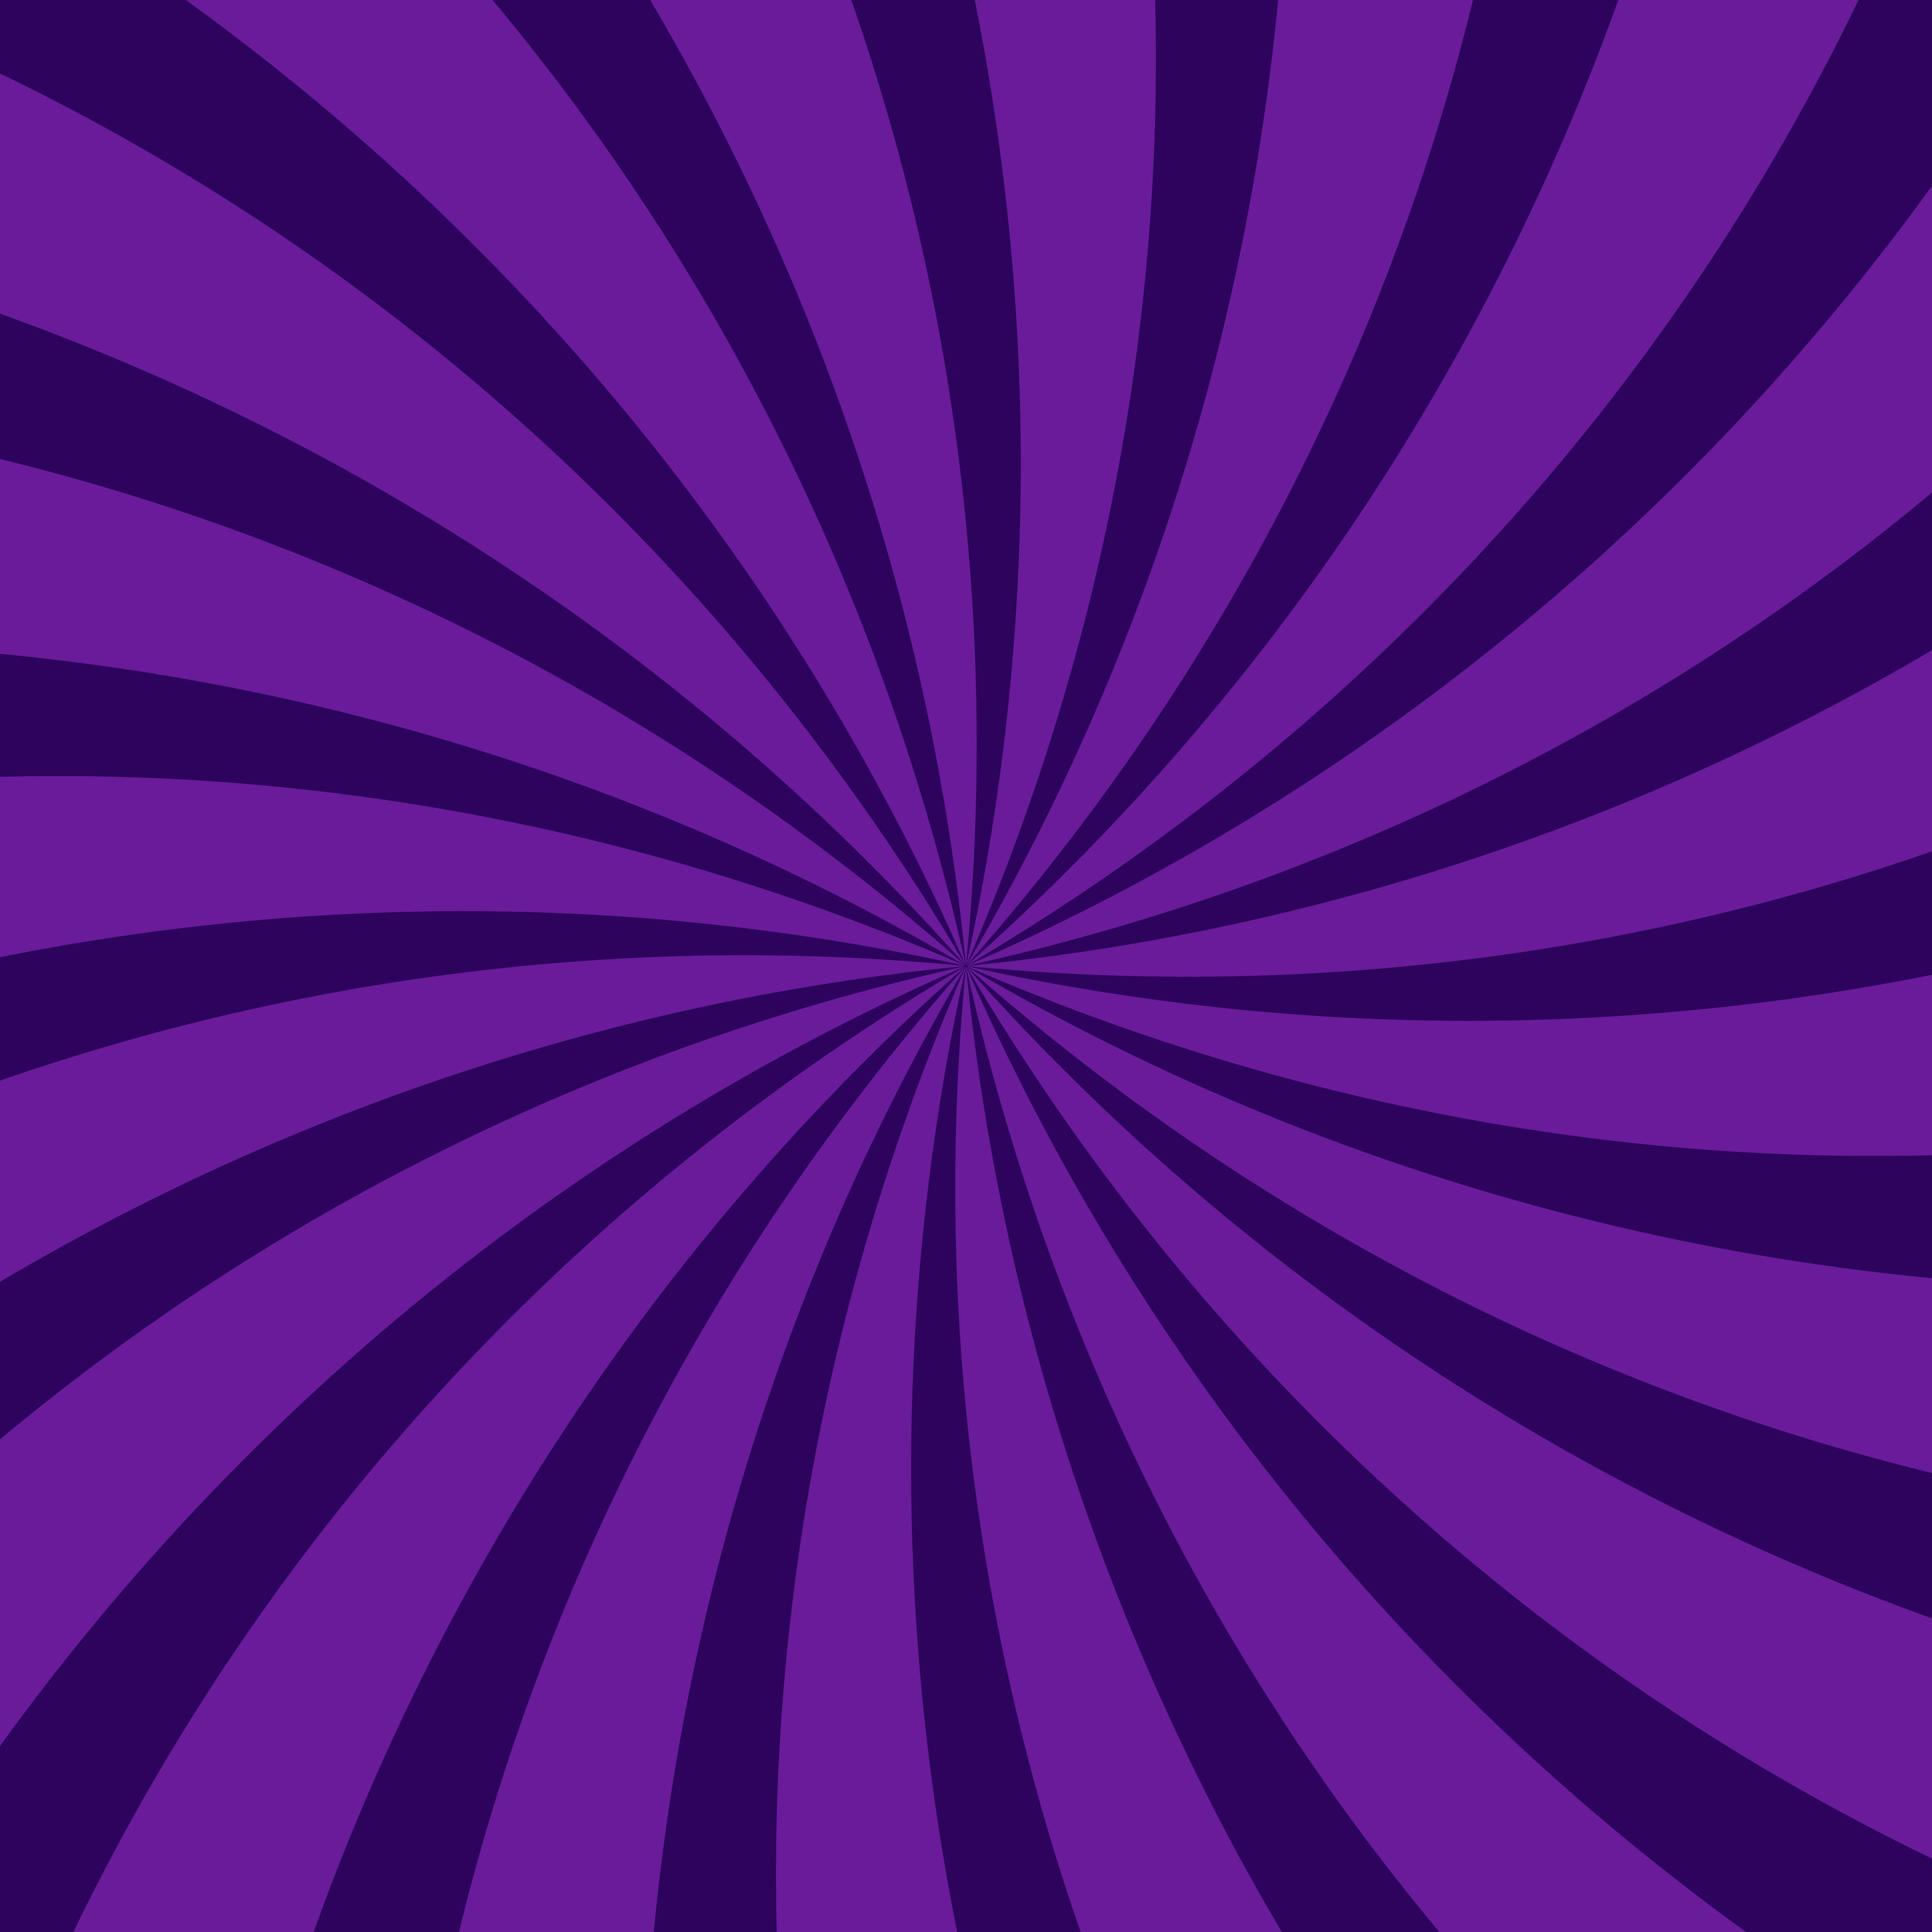 Abstract Swirling Radial Dark Purple Pattern Background